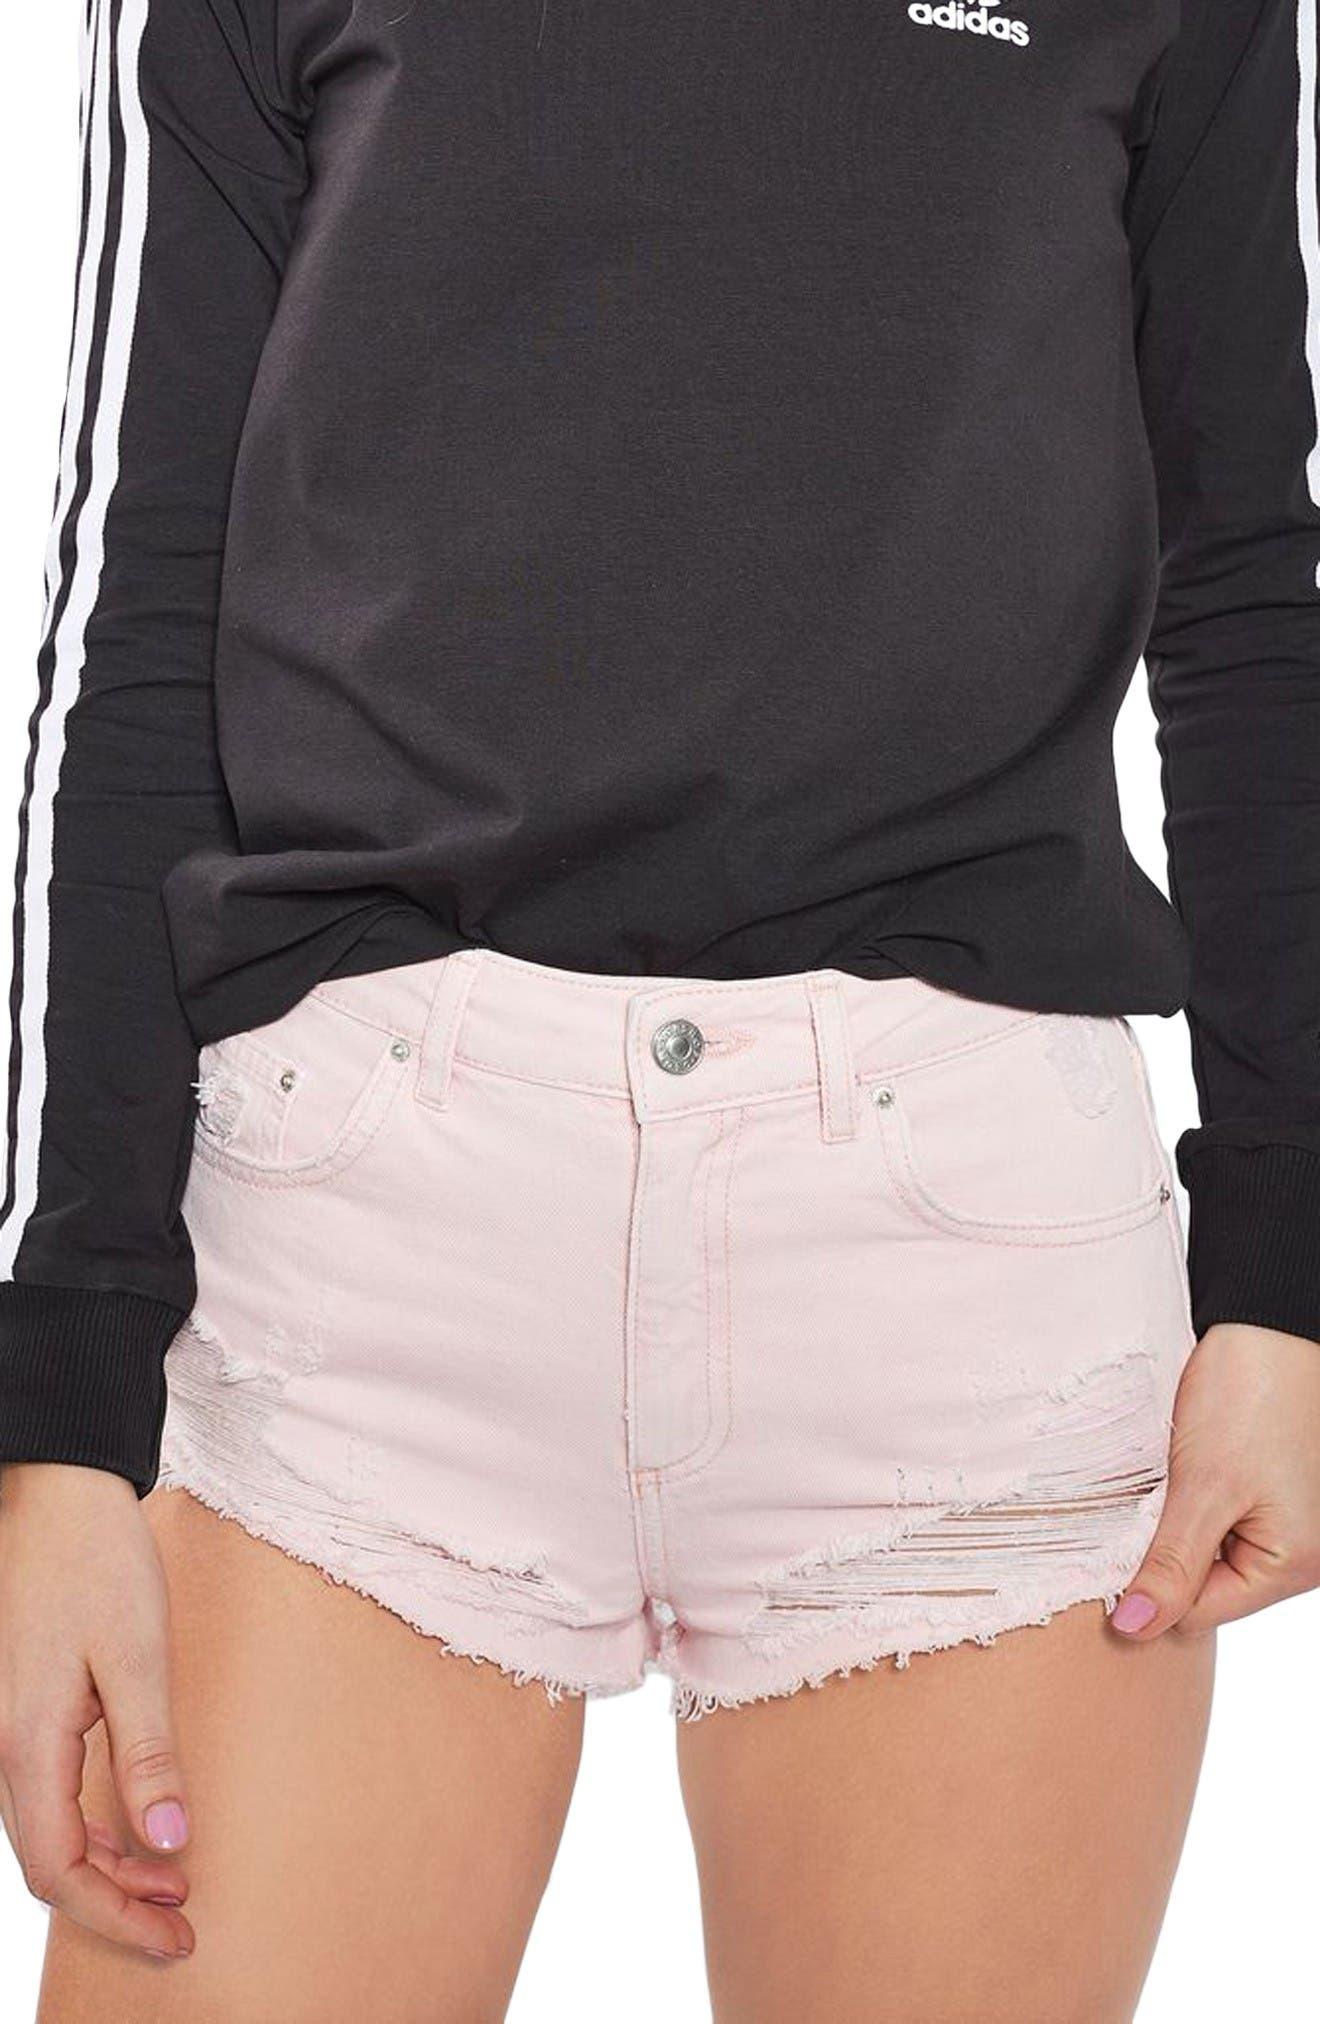 Alternate Image 1 Selected - Topshop Ripped Mini Denim Shorts (Regular & Petite)